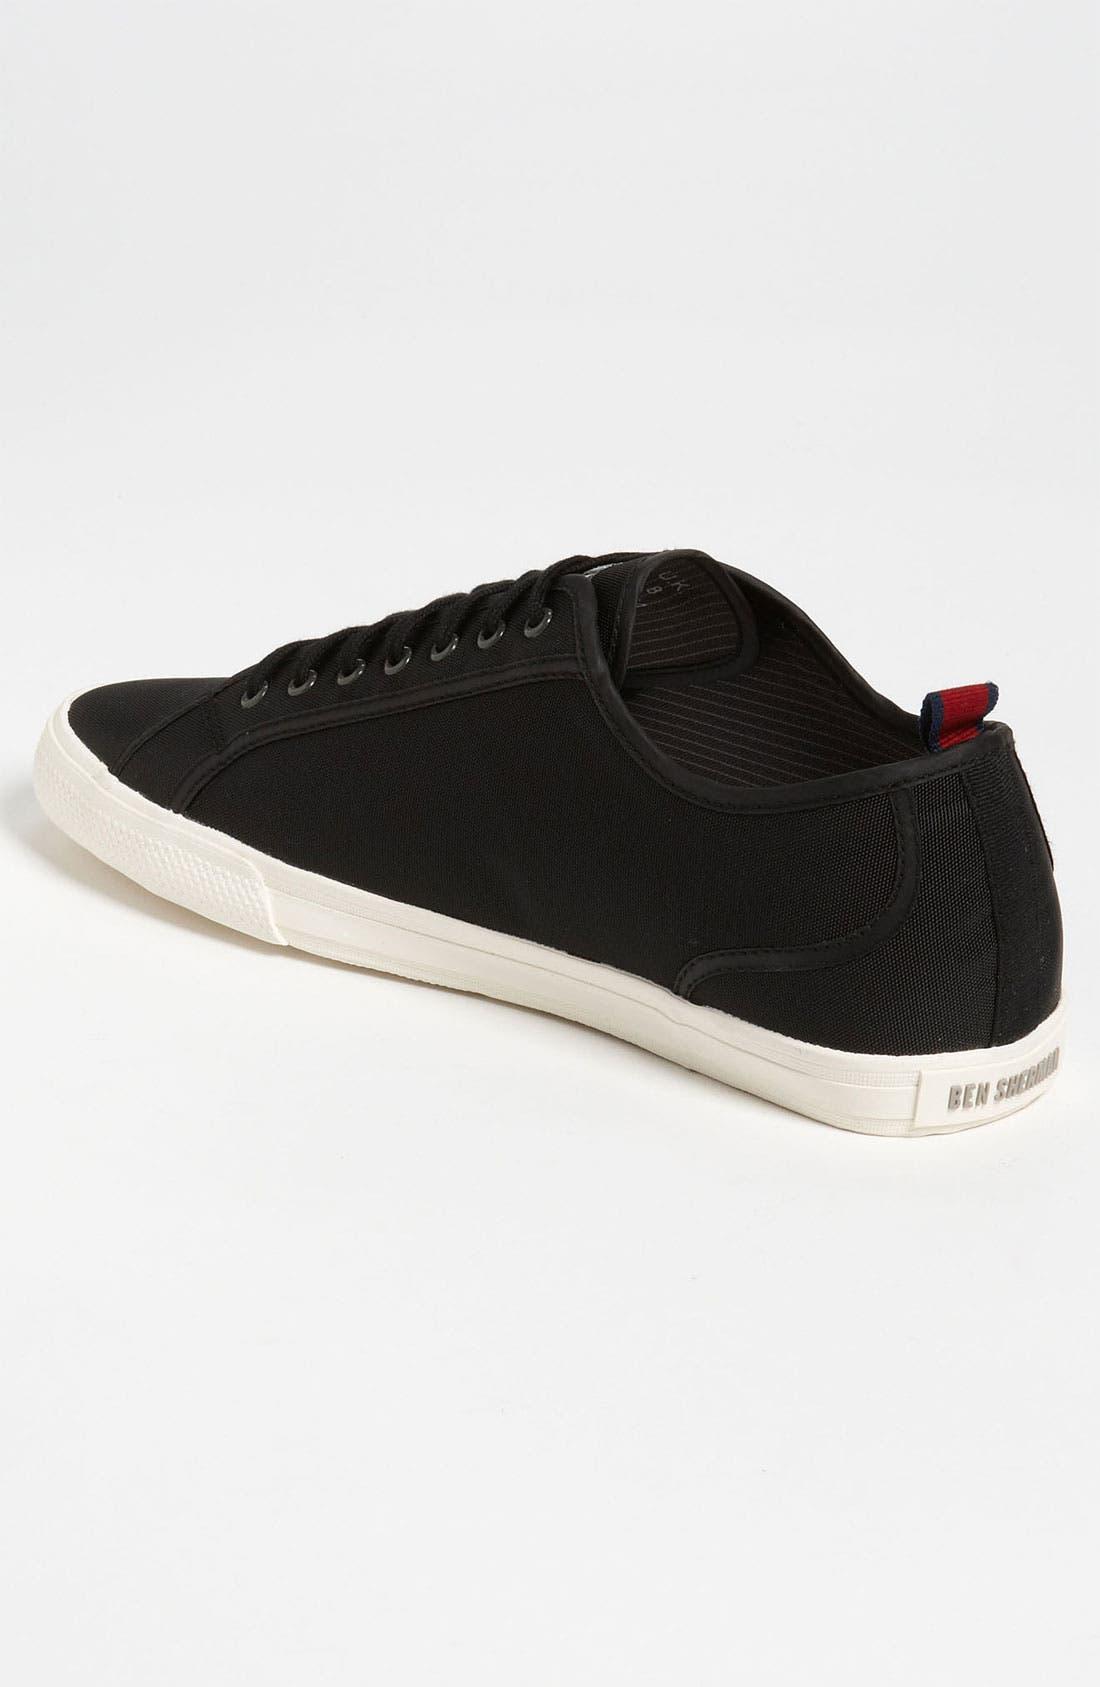 Alternate Image 2  - Ben Sherman 'Breckon' Sneaker